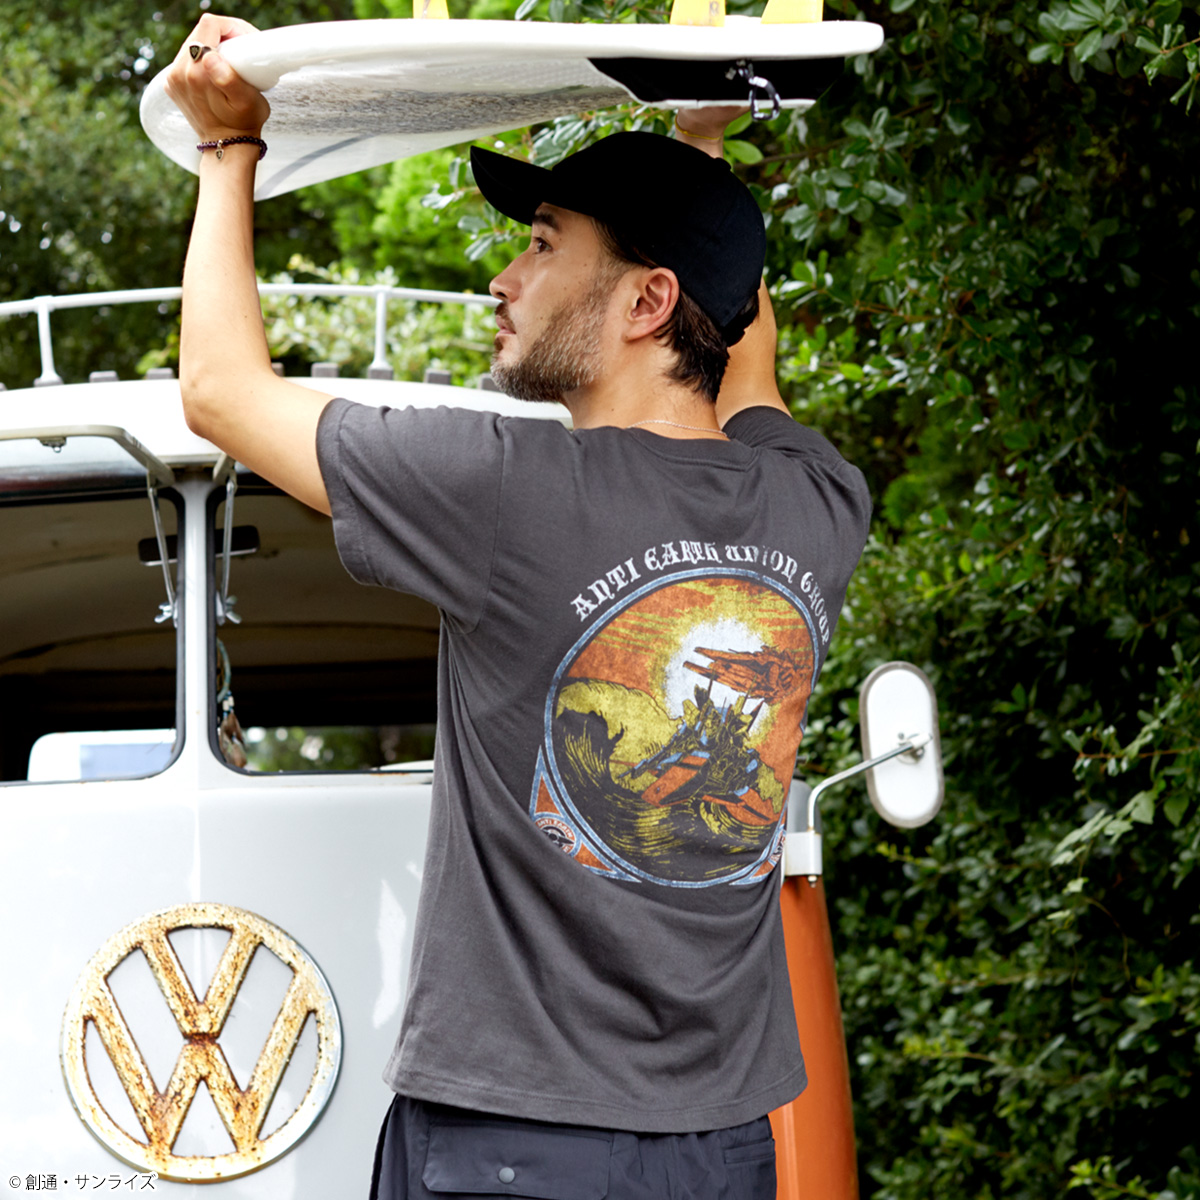 STRICT-G『機動戦士Zガンダム』 サーフポケットTシャツ サンセットビーチ百式